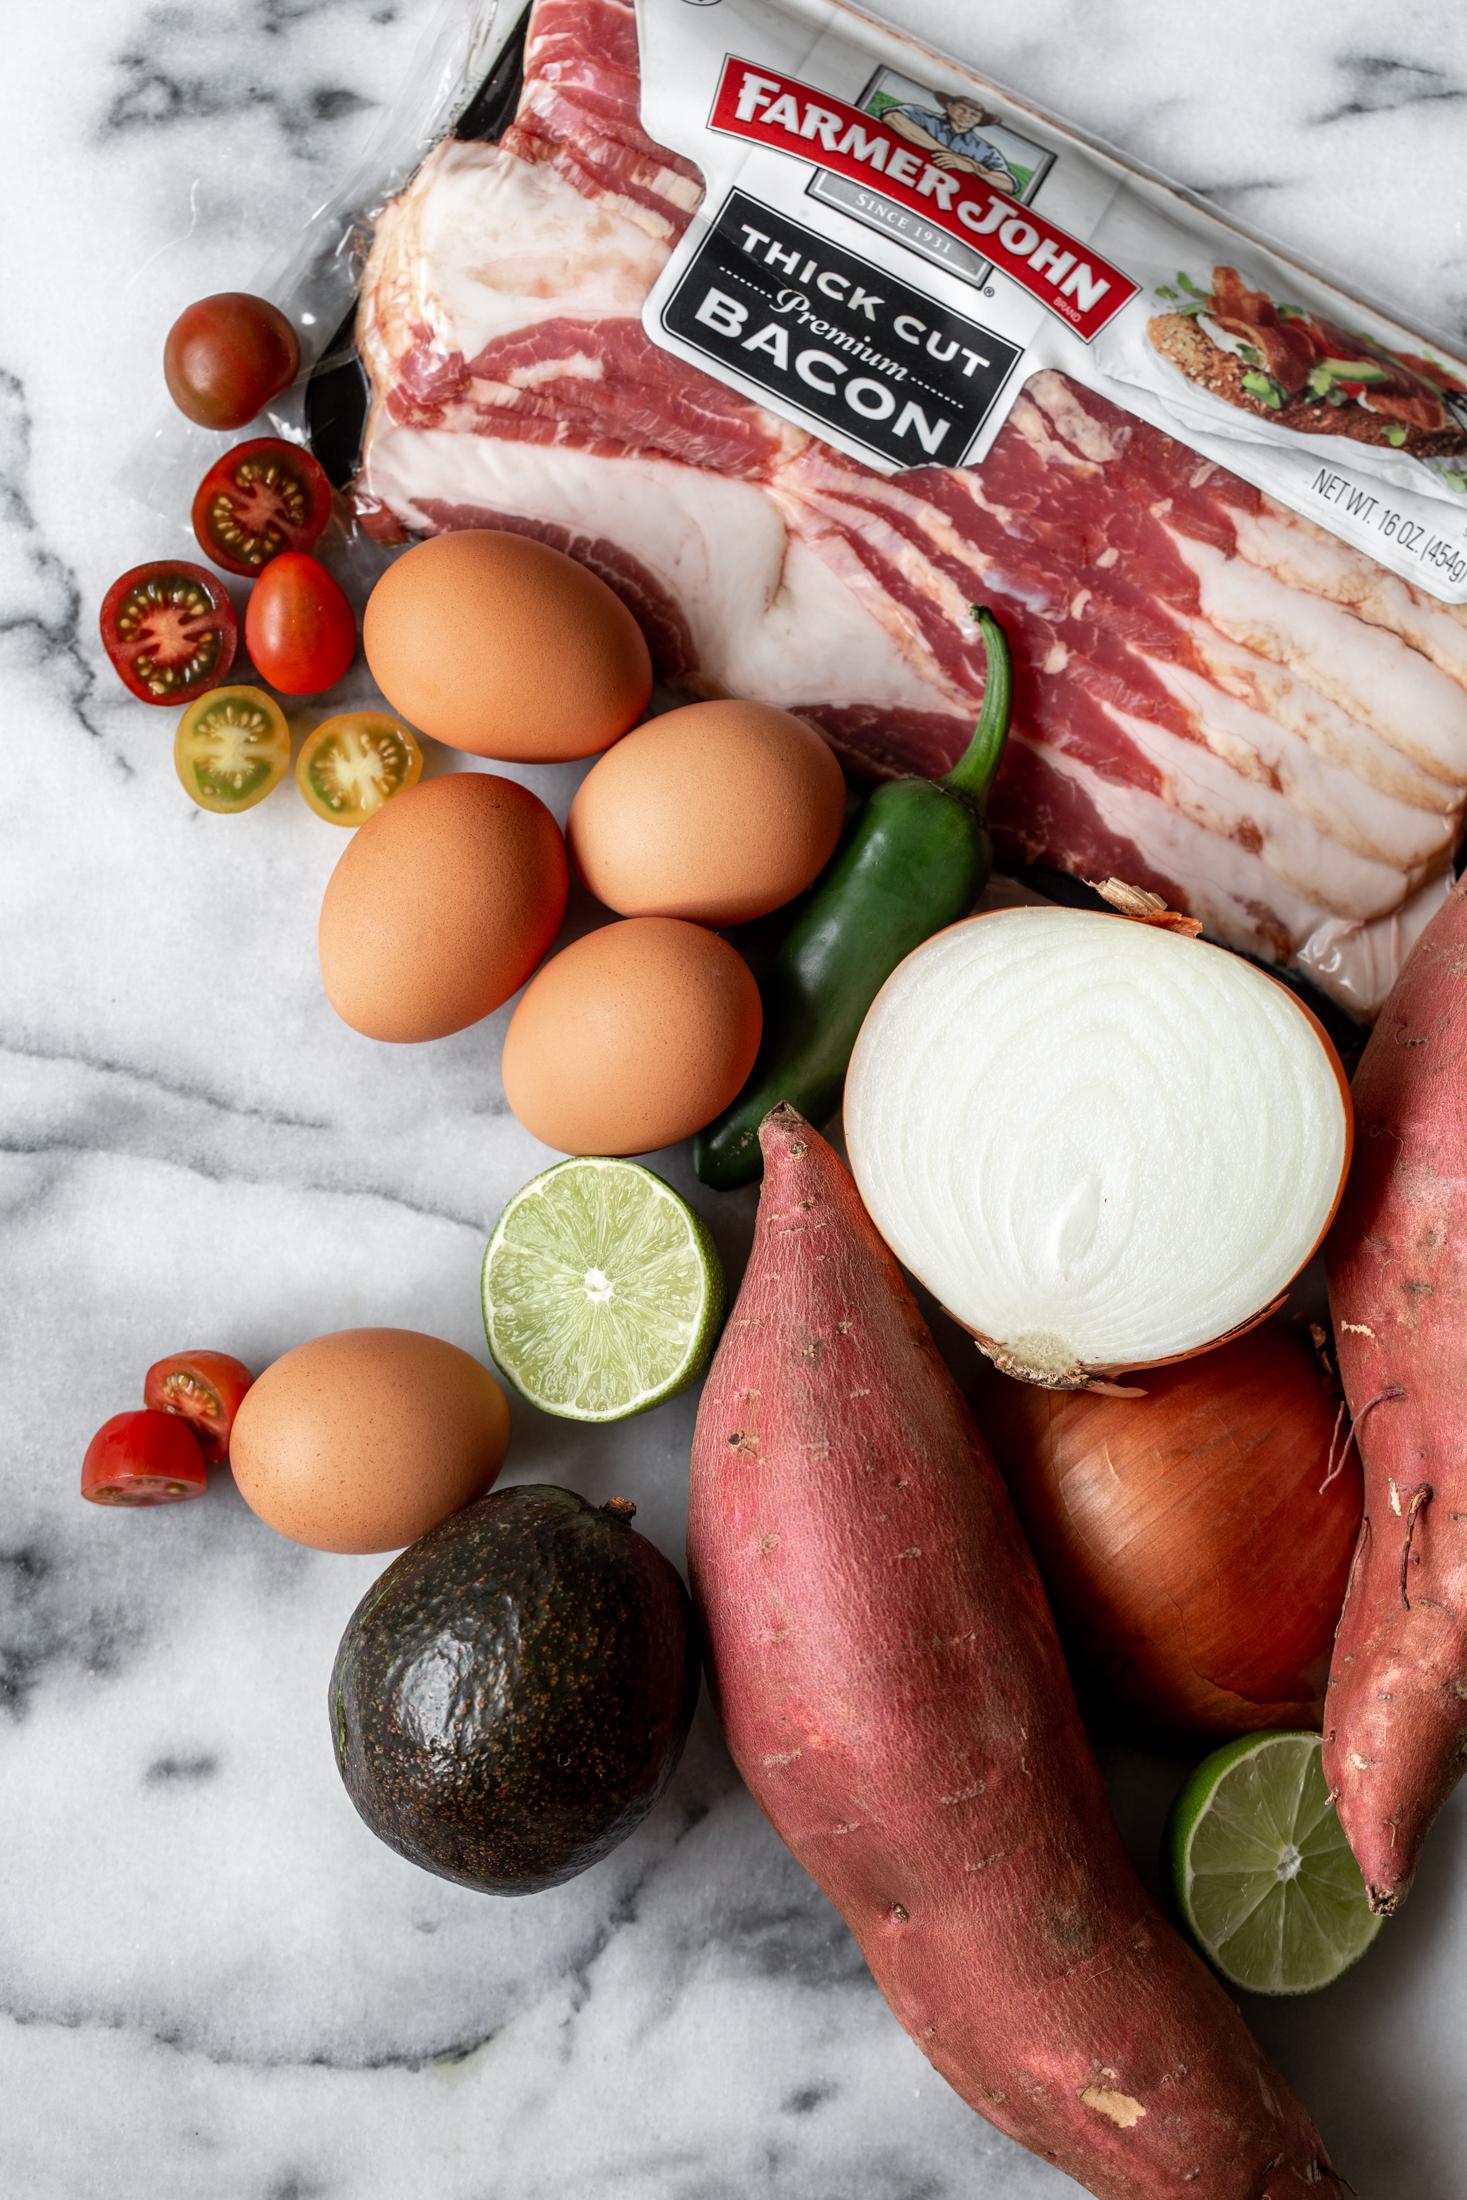 thick cut farmer john bacon ingredients